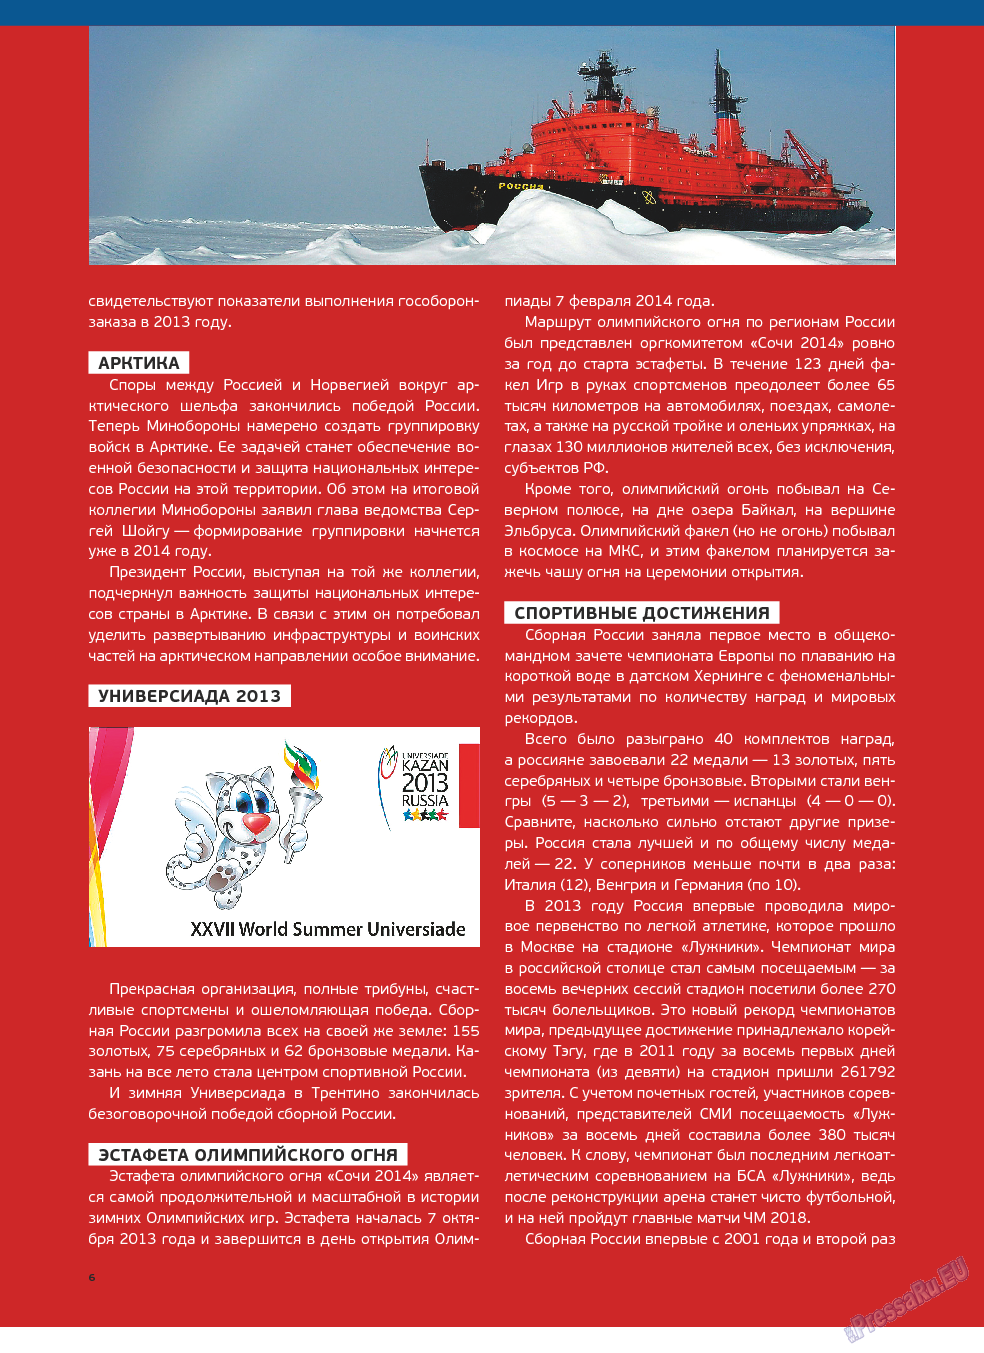 Артек (журнал). 2013 год, номер 6, стр. 8